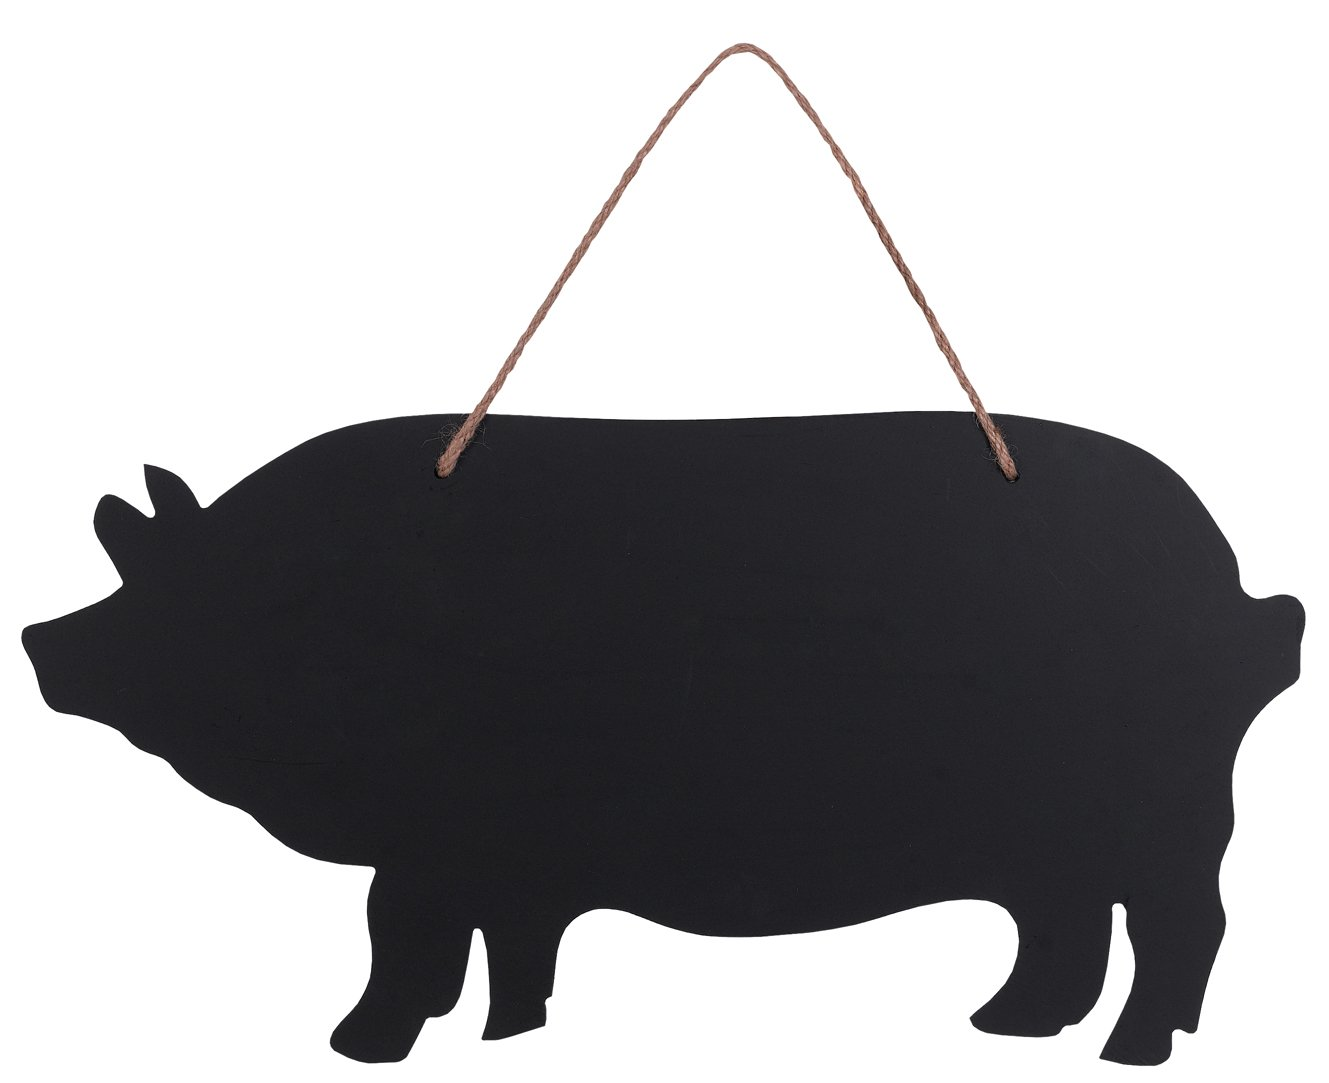 Hills Imports Pig Chalkboard